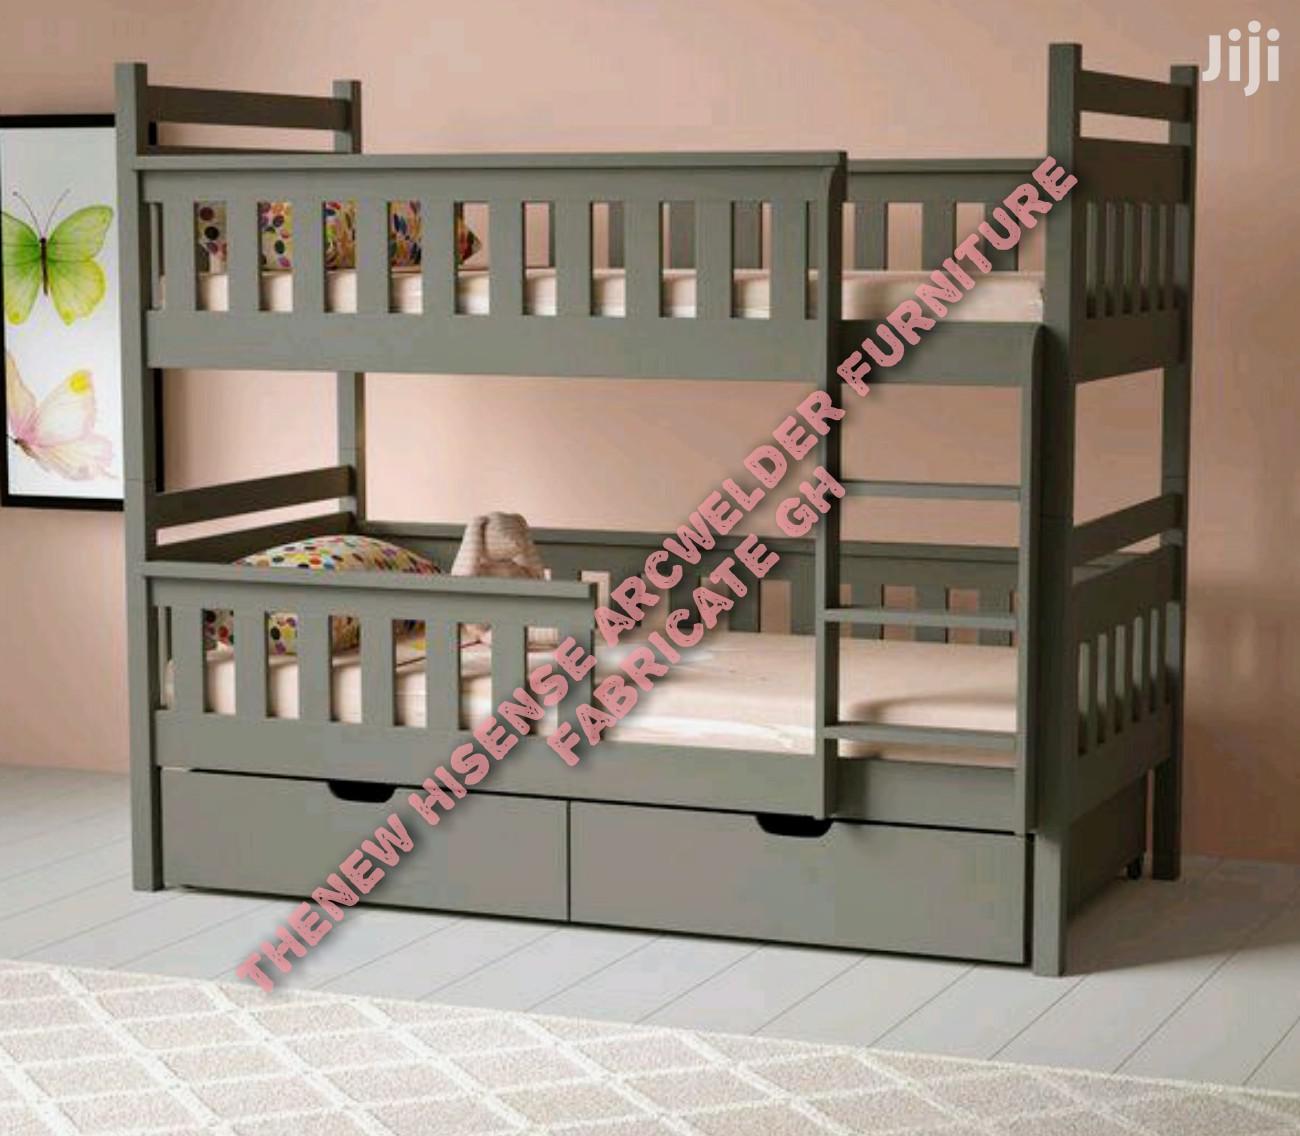 Picture of: Metal Bunk Bed In Achimota Furniture Henakku Solomon Jiji Com Gh